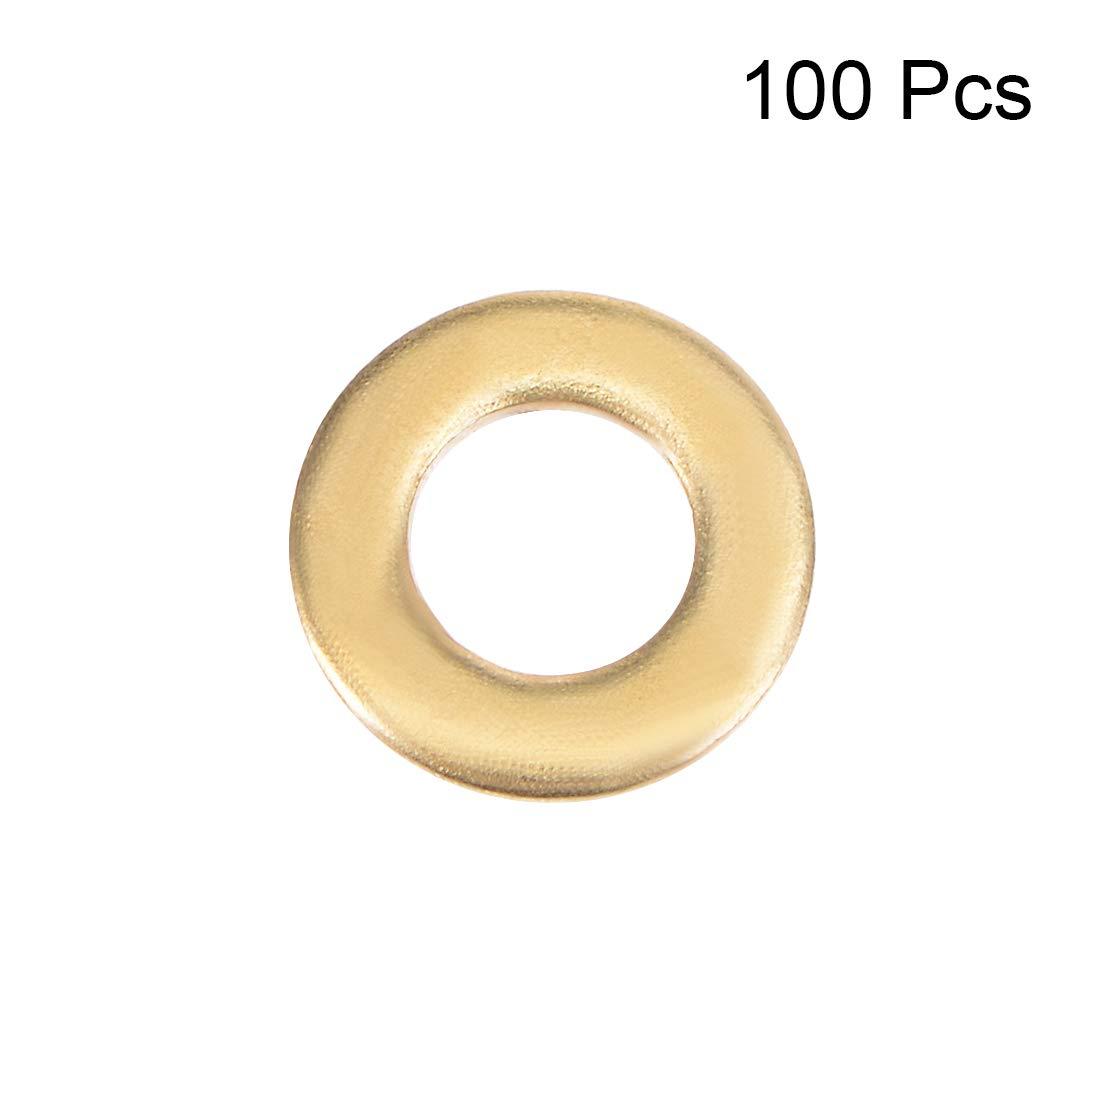 260mm OD 120mm ID 2400rpm Maximum Rotational Speed Schaeffler Technologies Co. Metric C4 Clearance 106mm Width FAG 23324AS-MA-T41A Shaker Screen Spherical Roller Bearing Brass Cage